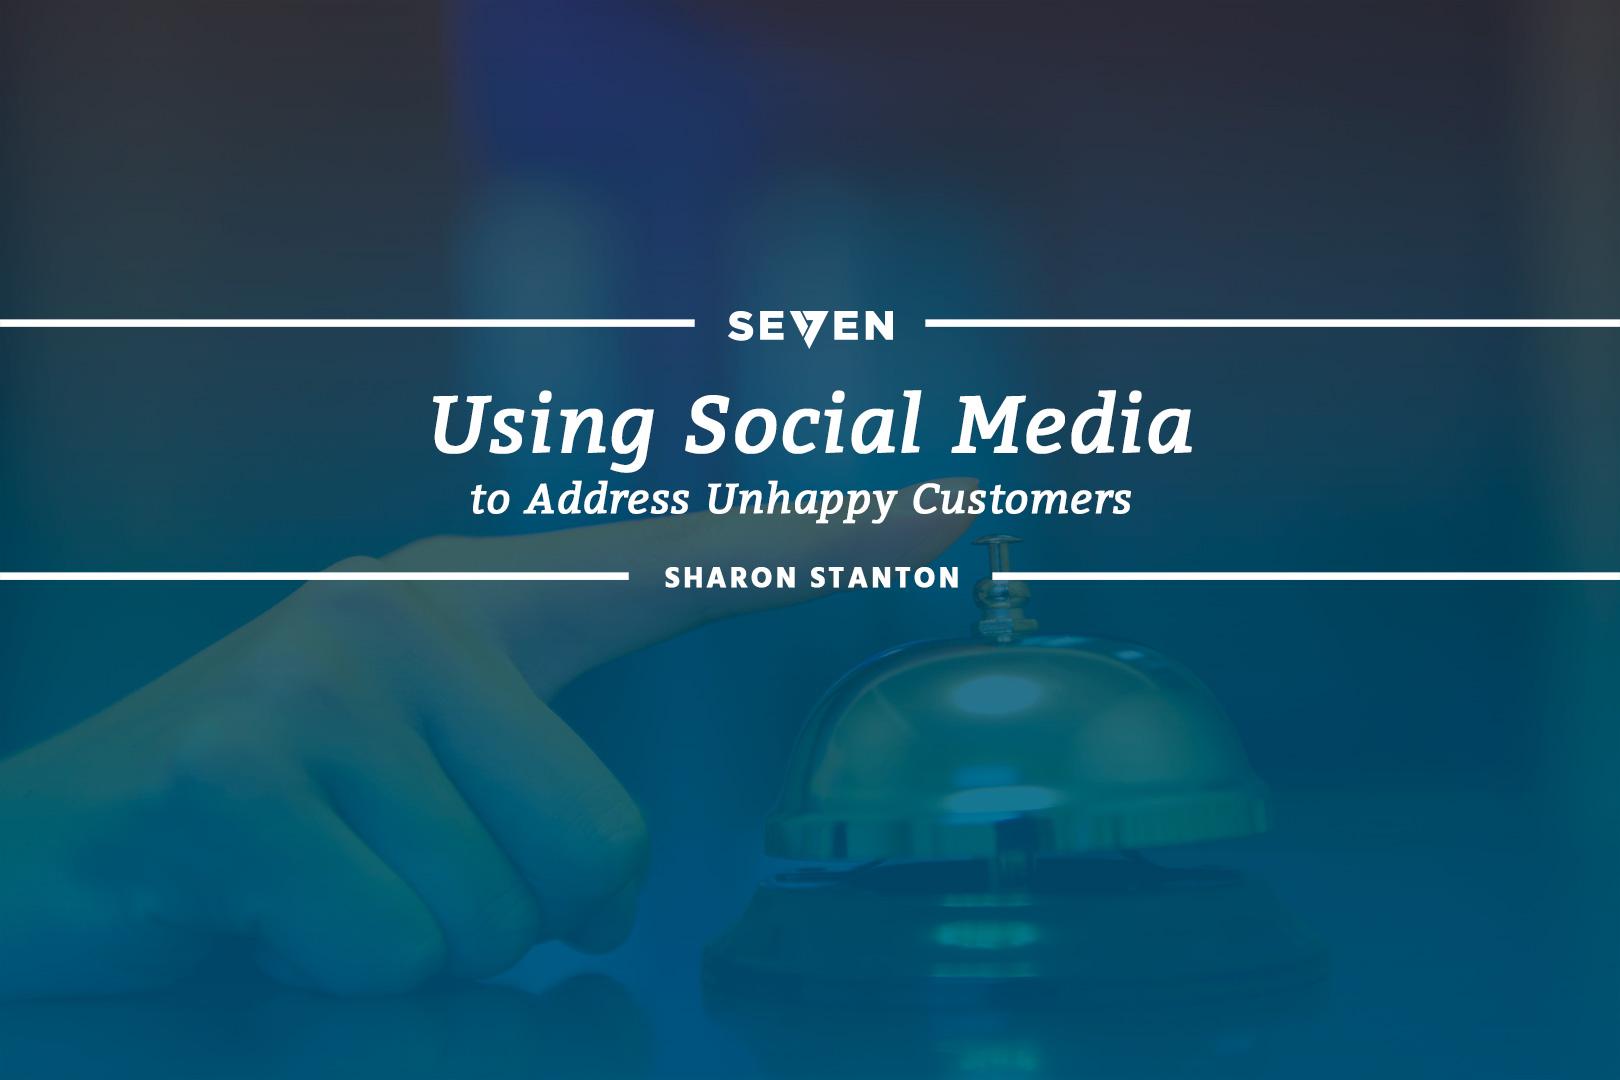 Using Social Media to Address Unhappy Customers